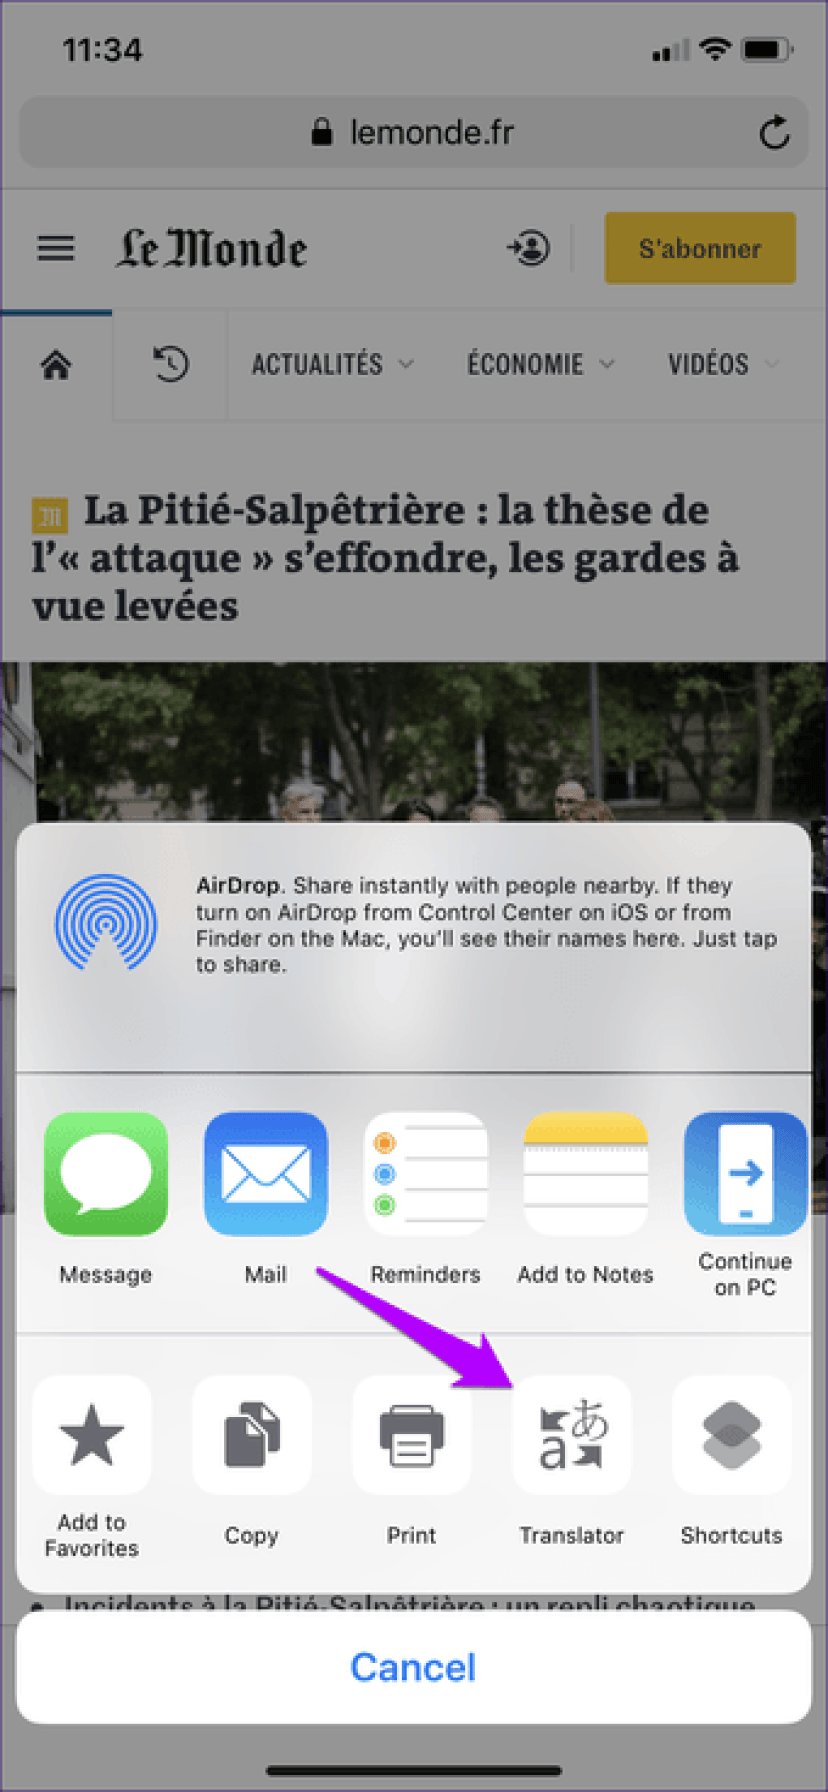 Iphone Ipad Translate Languages 6